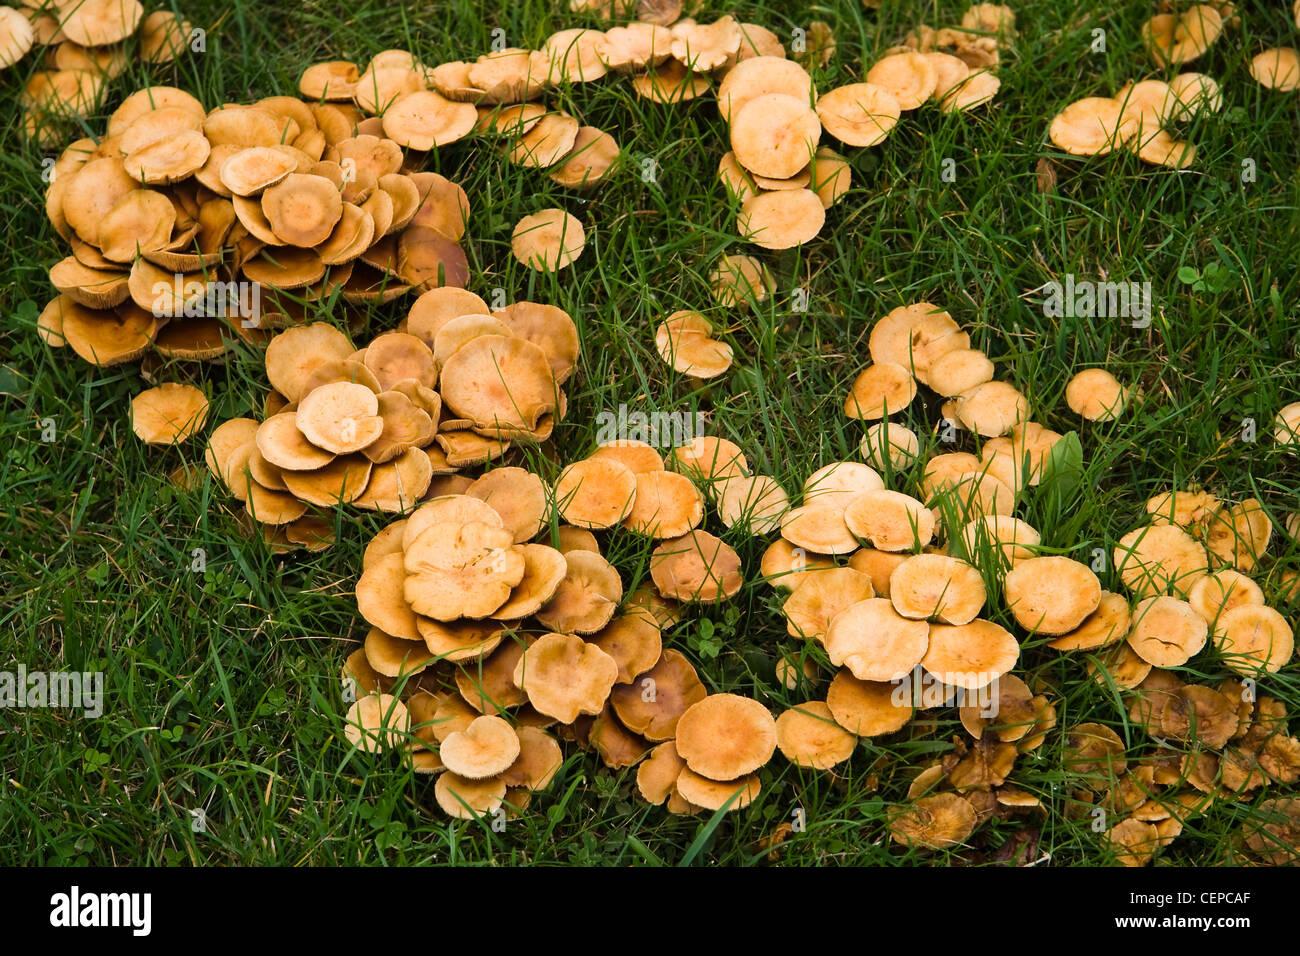 fairy ring mushroom stockfotos fairy ring mushroom bilder alamy. Black Bedroom Furniture Sets. Home Design Ideas